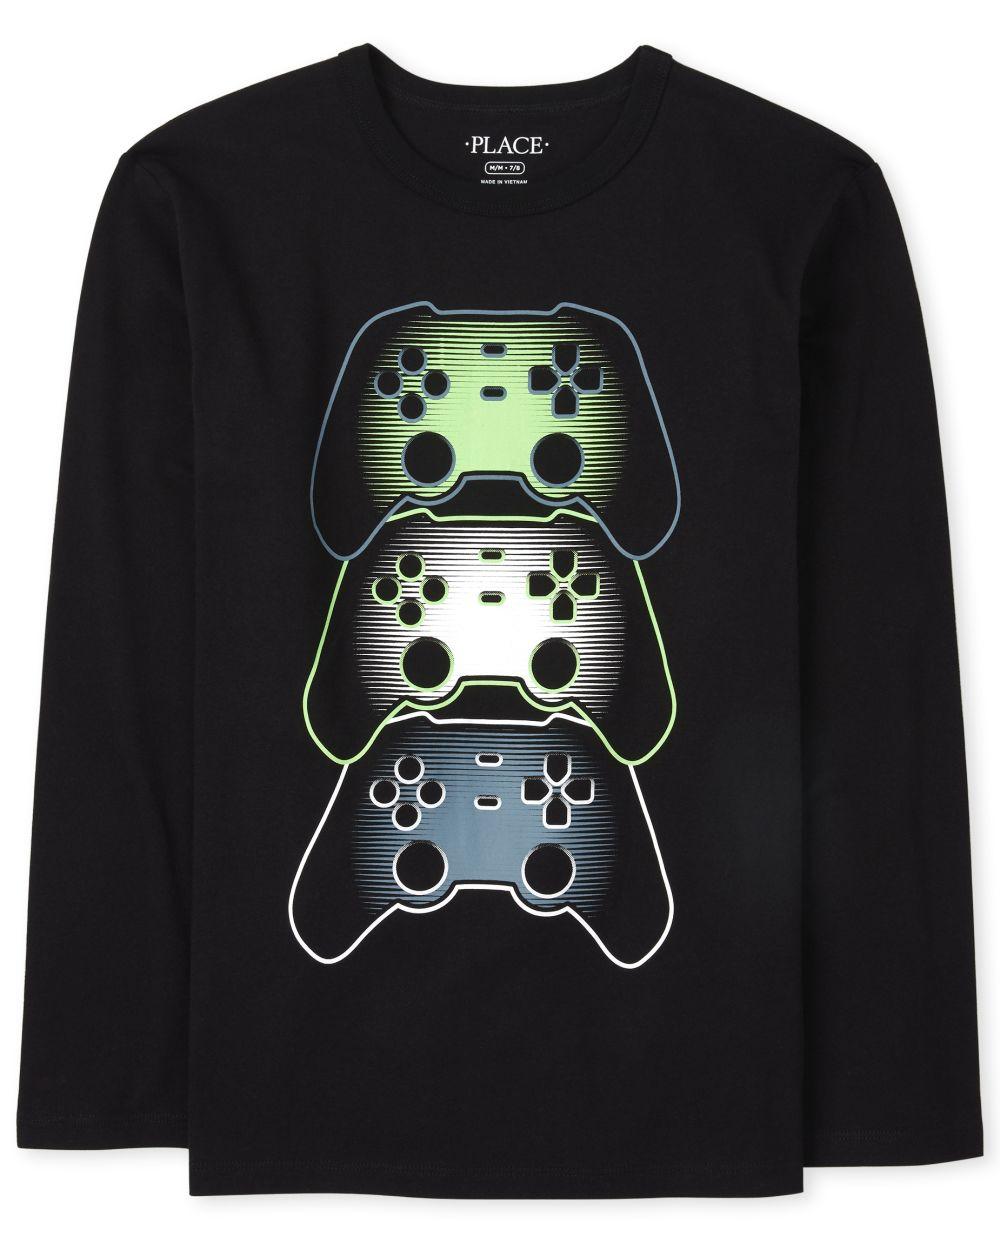 Boys Video Game Graphic Tee - Black T-Shirt